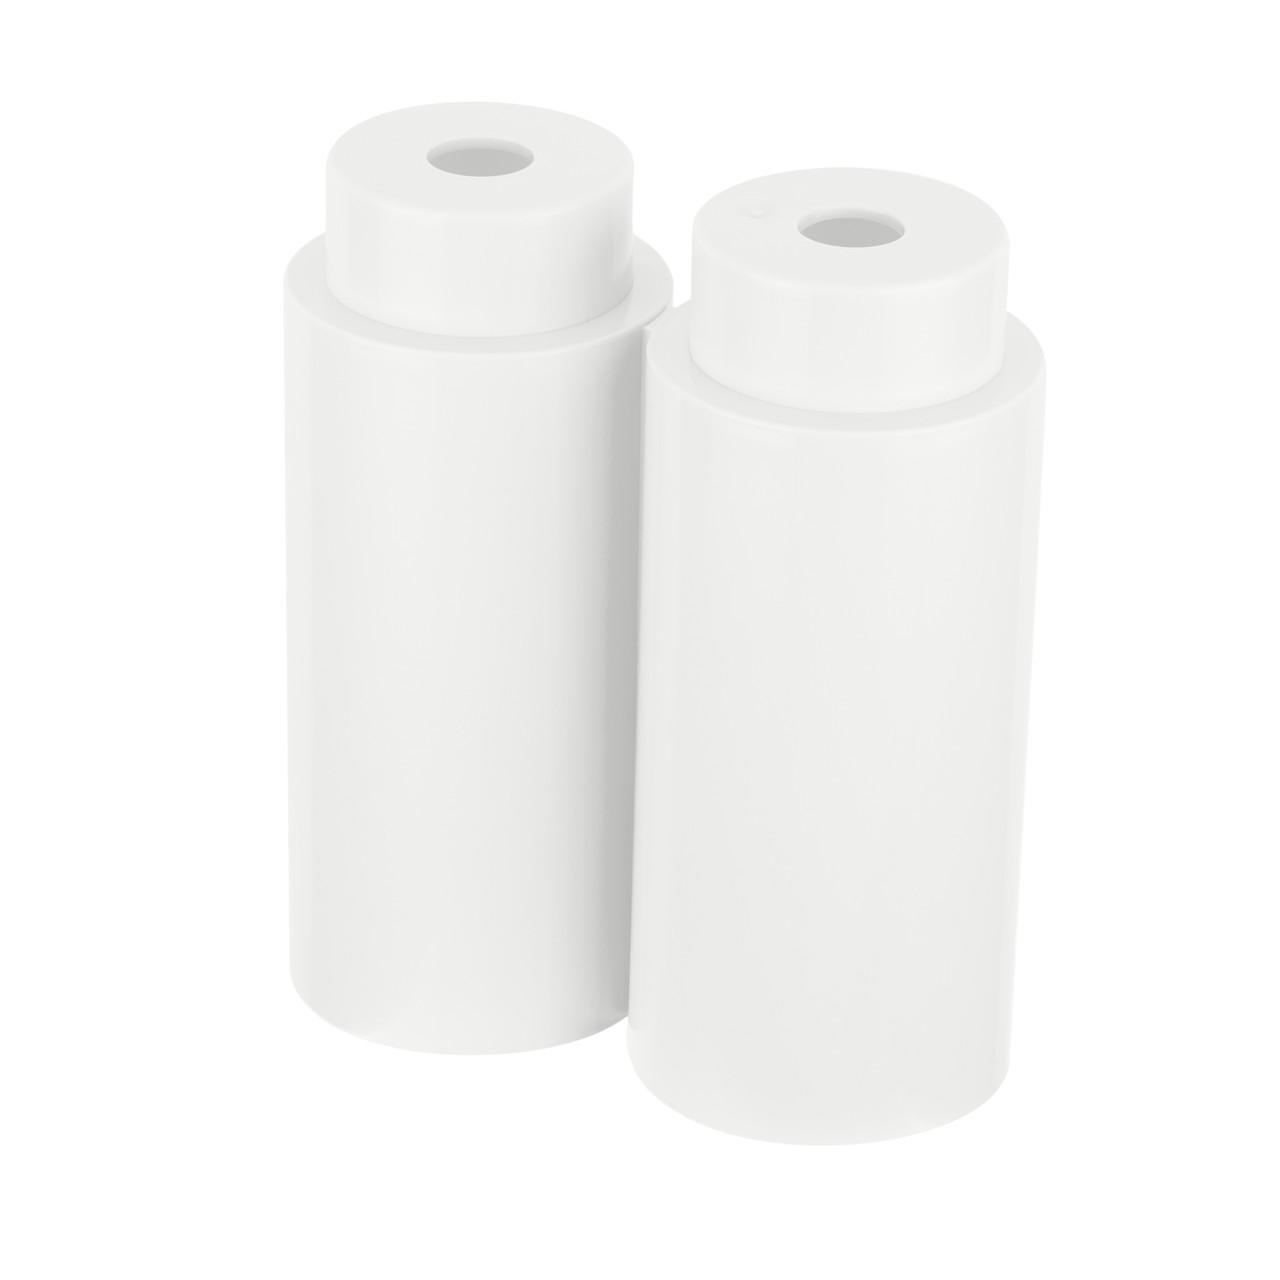 The white double tube EverCurve